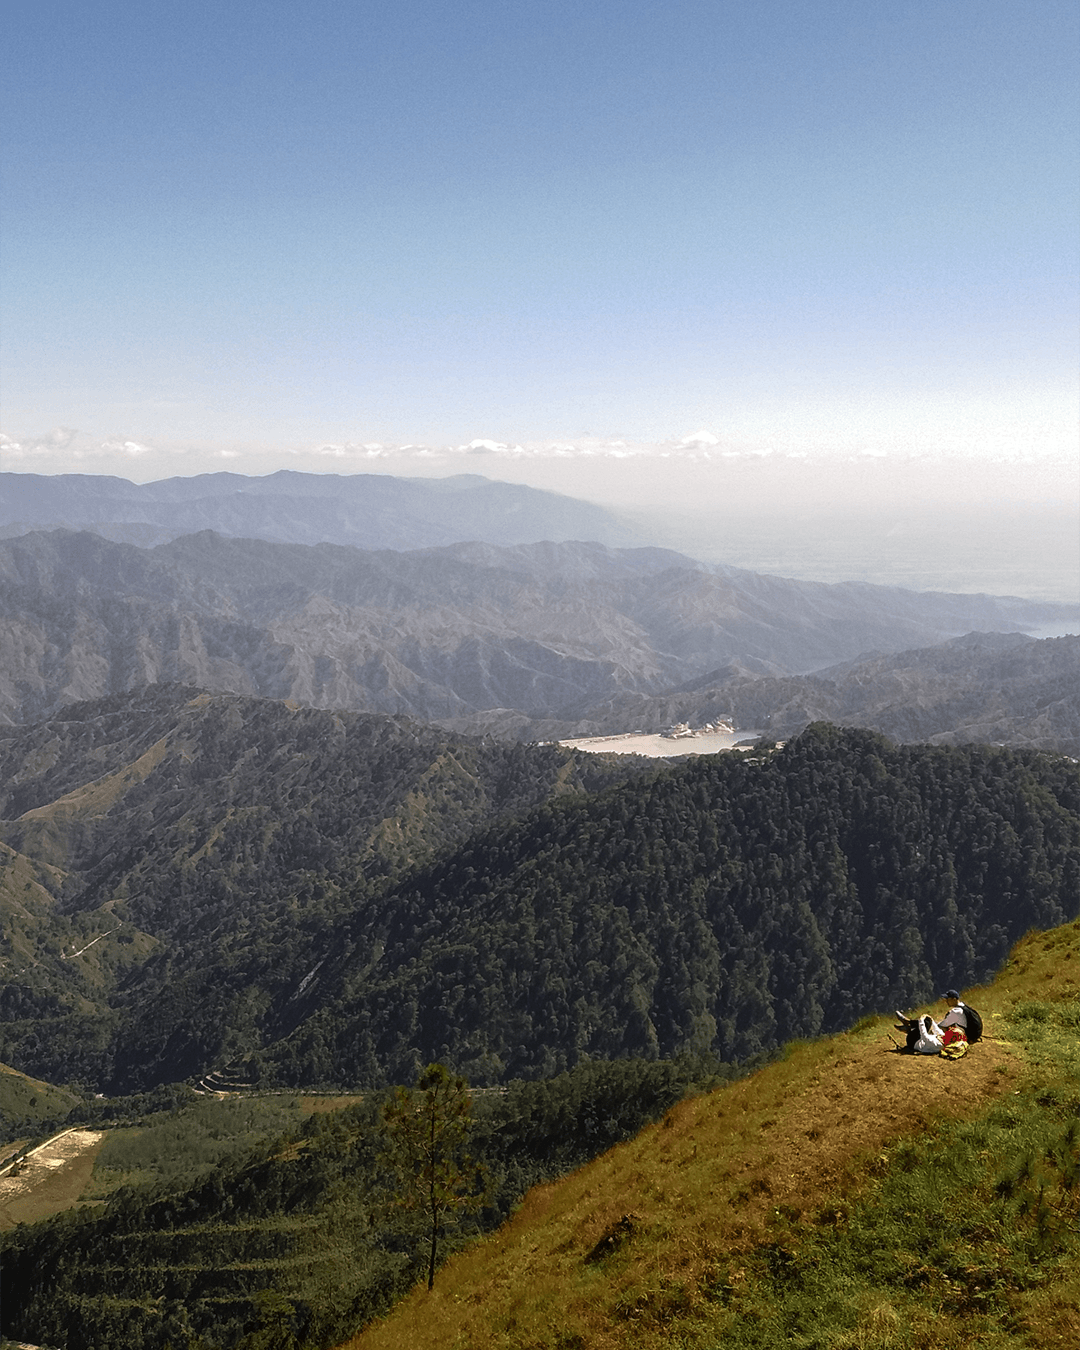 Mt. Ulap, Benguet